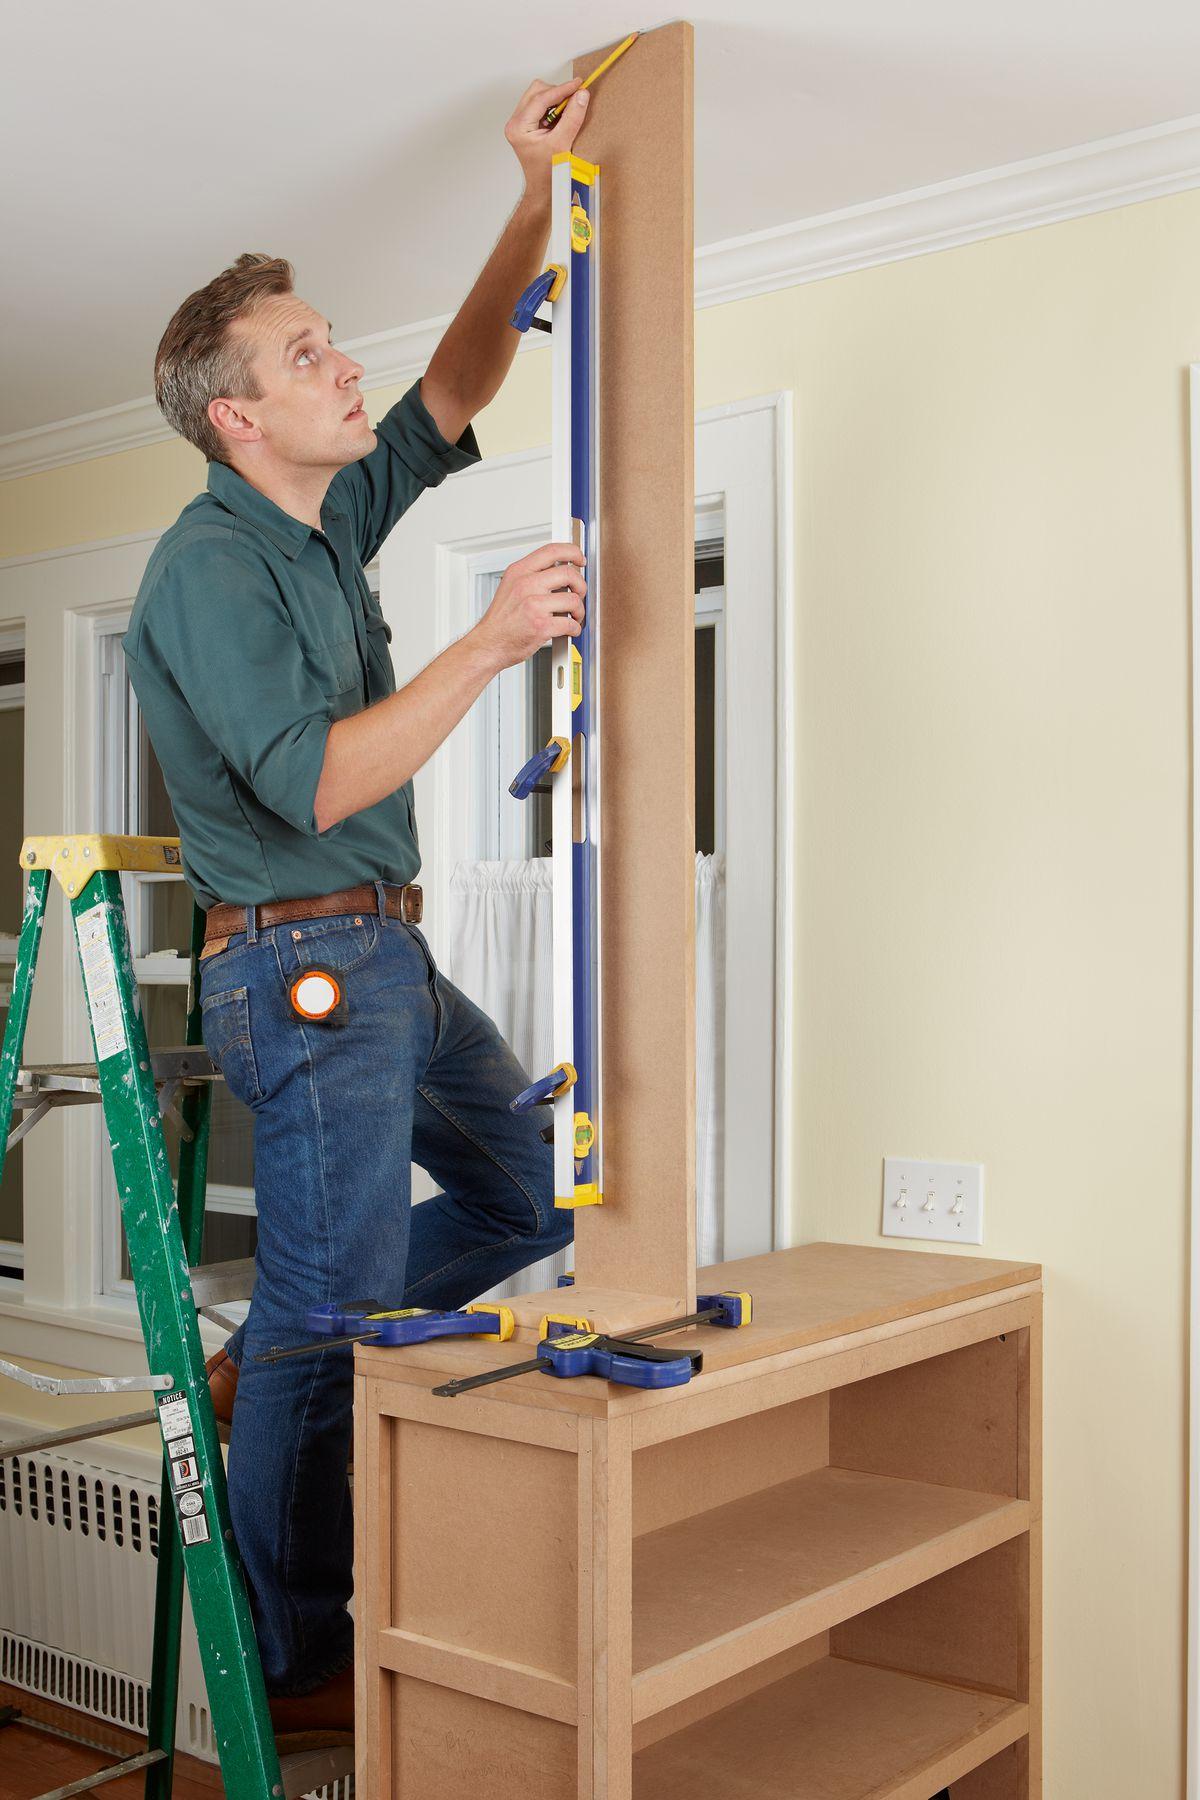 Man Measures Size Of Column